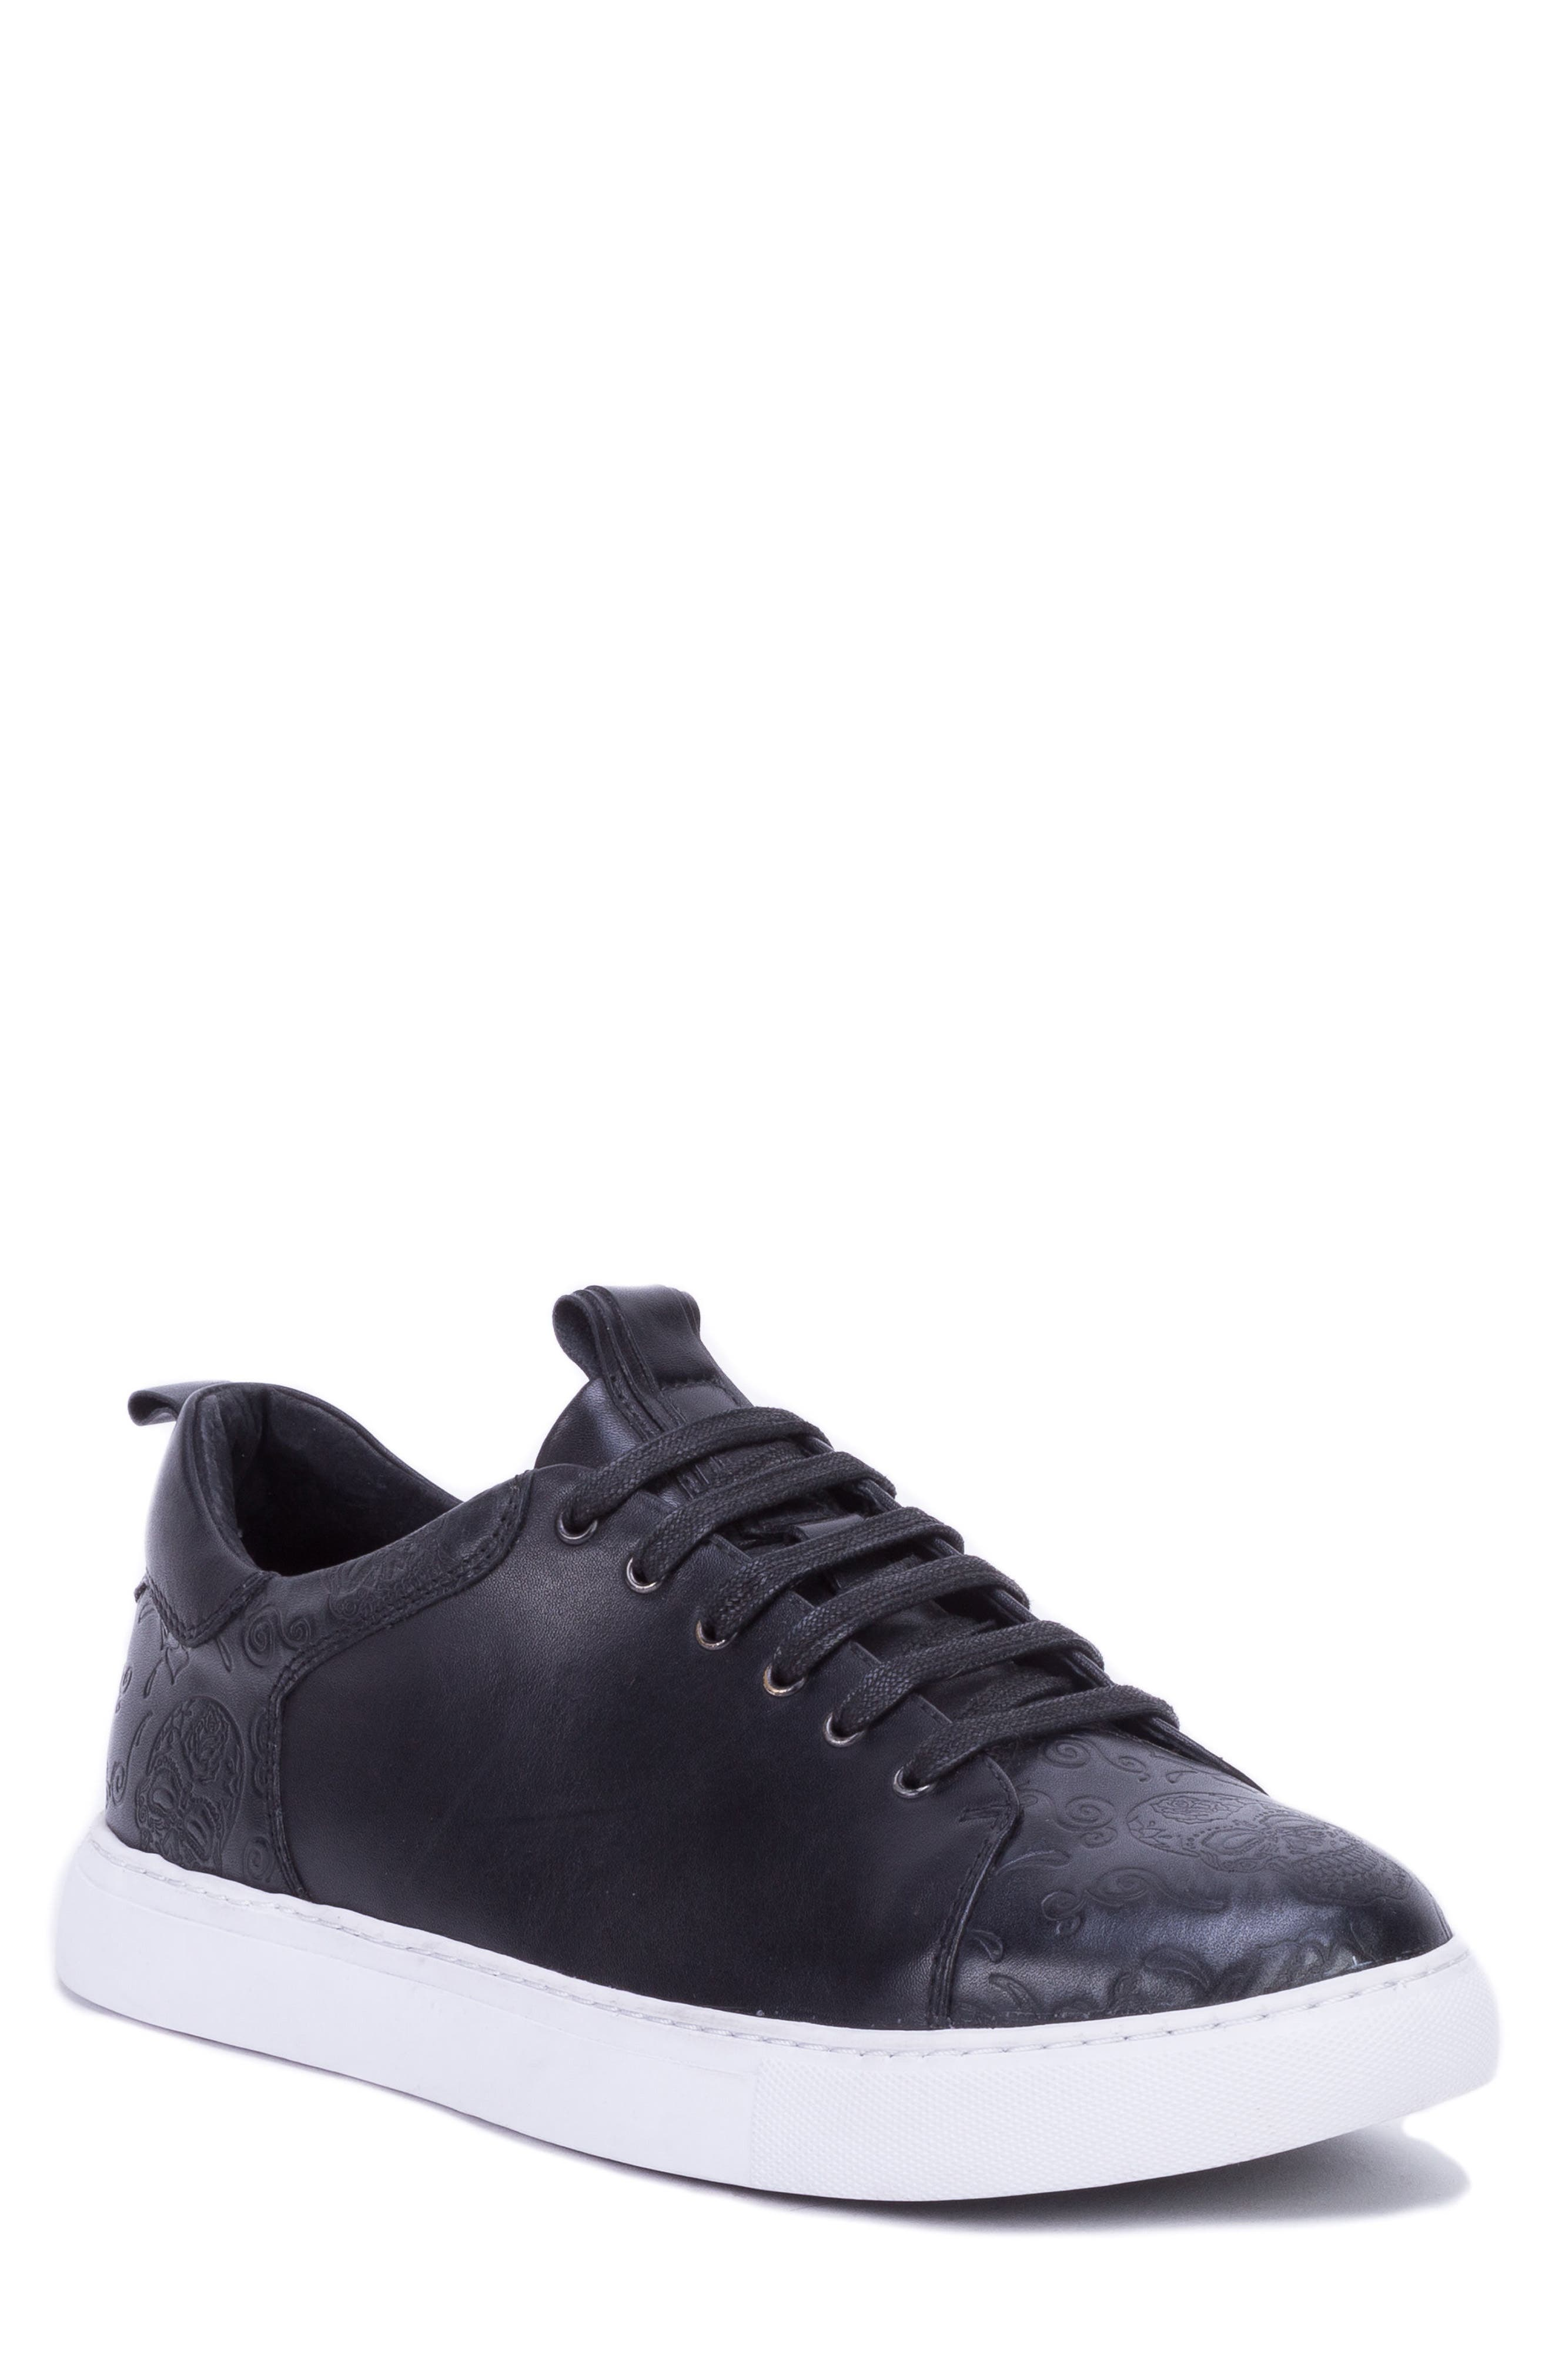 Robert Graham Sanderson Embossed Sneaker- Black